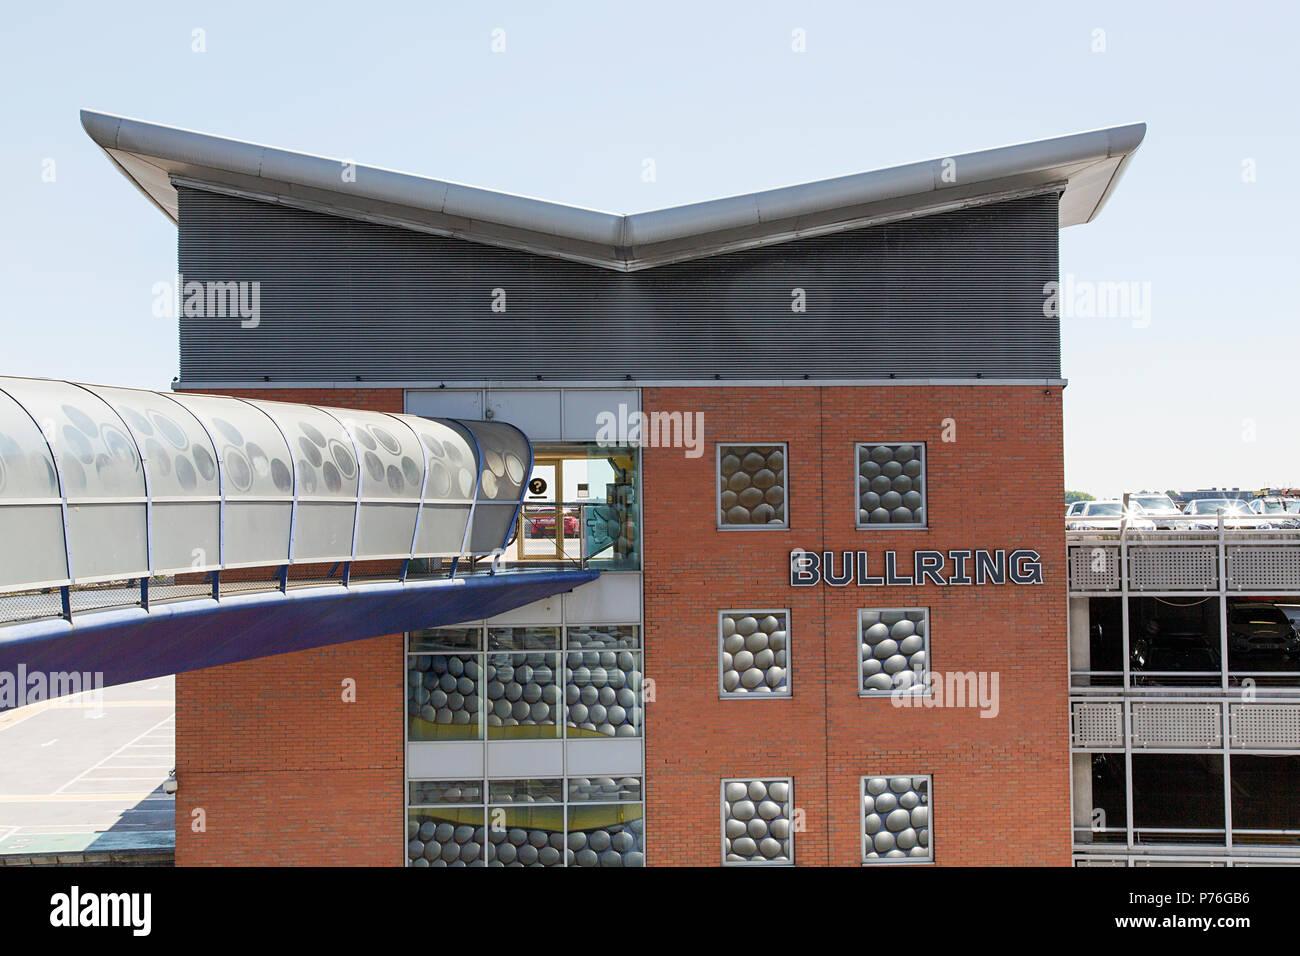 Birmingham, UK: June 29, 2018: Selfridges Moor Street Car Park. A conveniently located multi-story car park opposite the iconic Selfridges building. - Stock Image